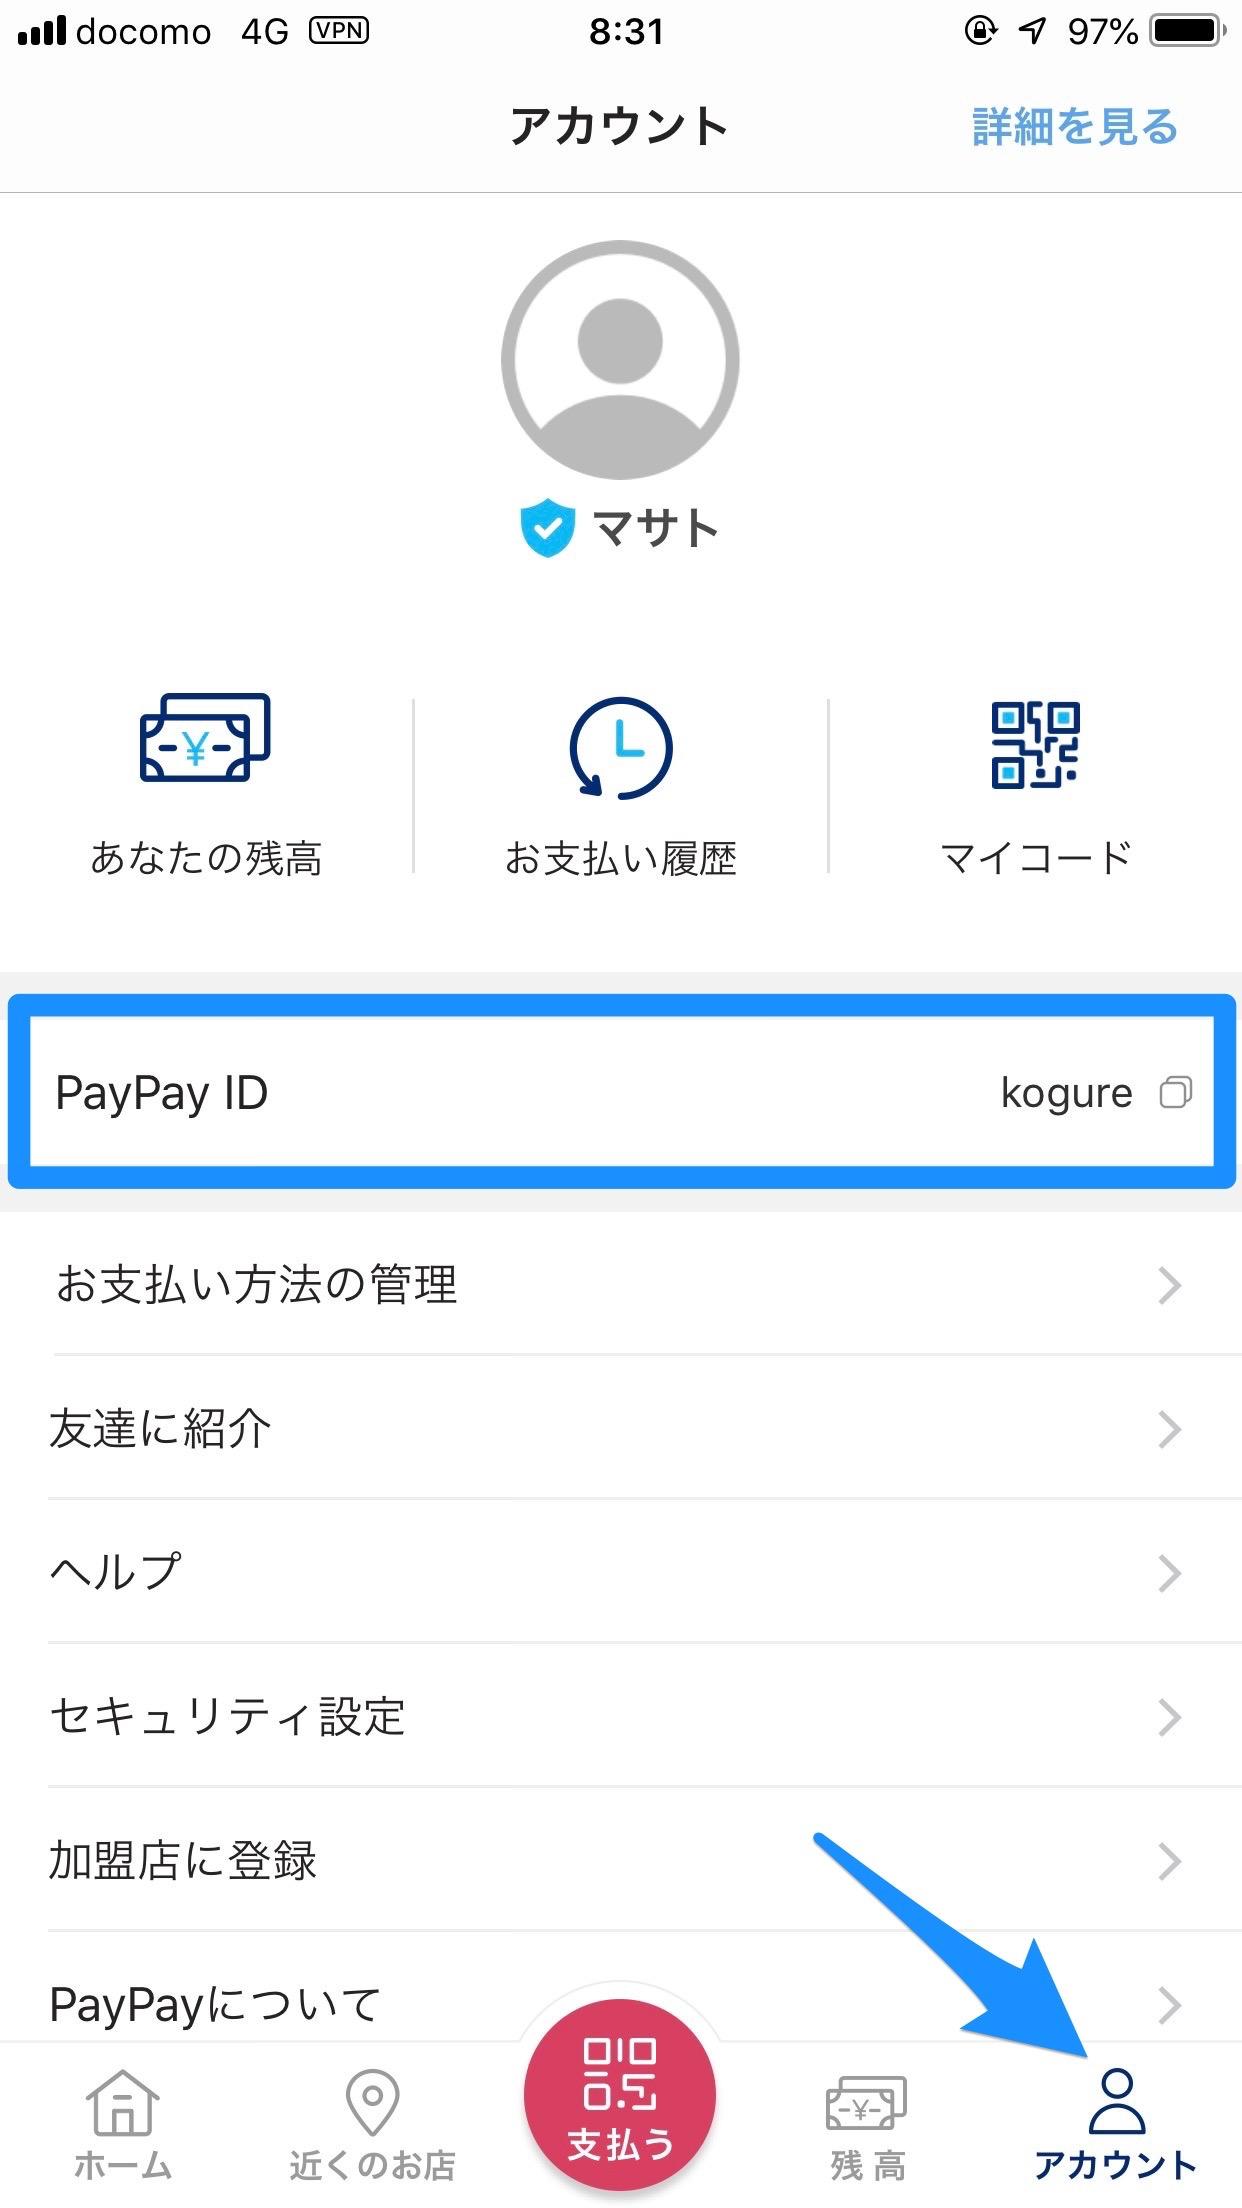 【PayPay】送金可能な「PayPay ID」